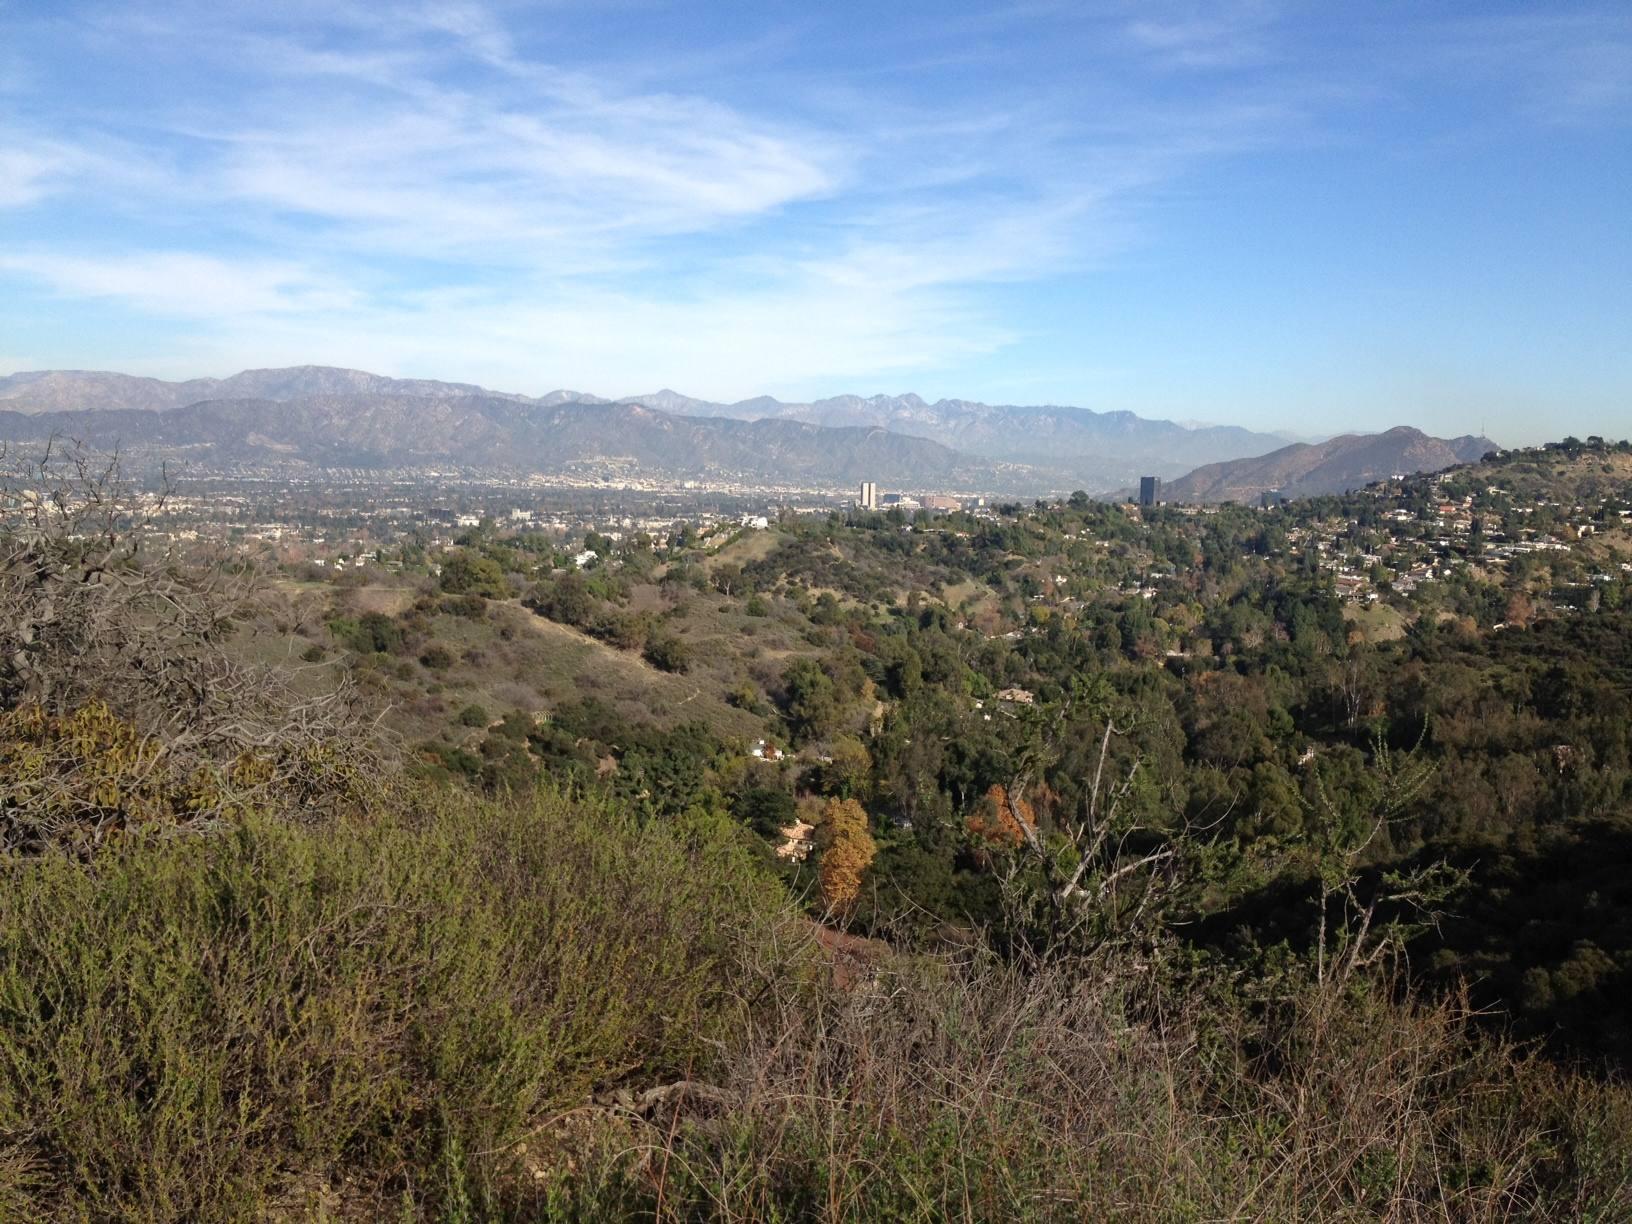 Studio City viewed from TreePeople